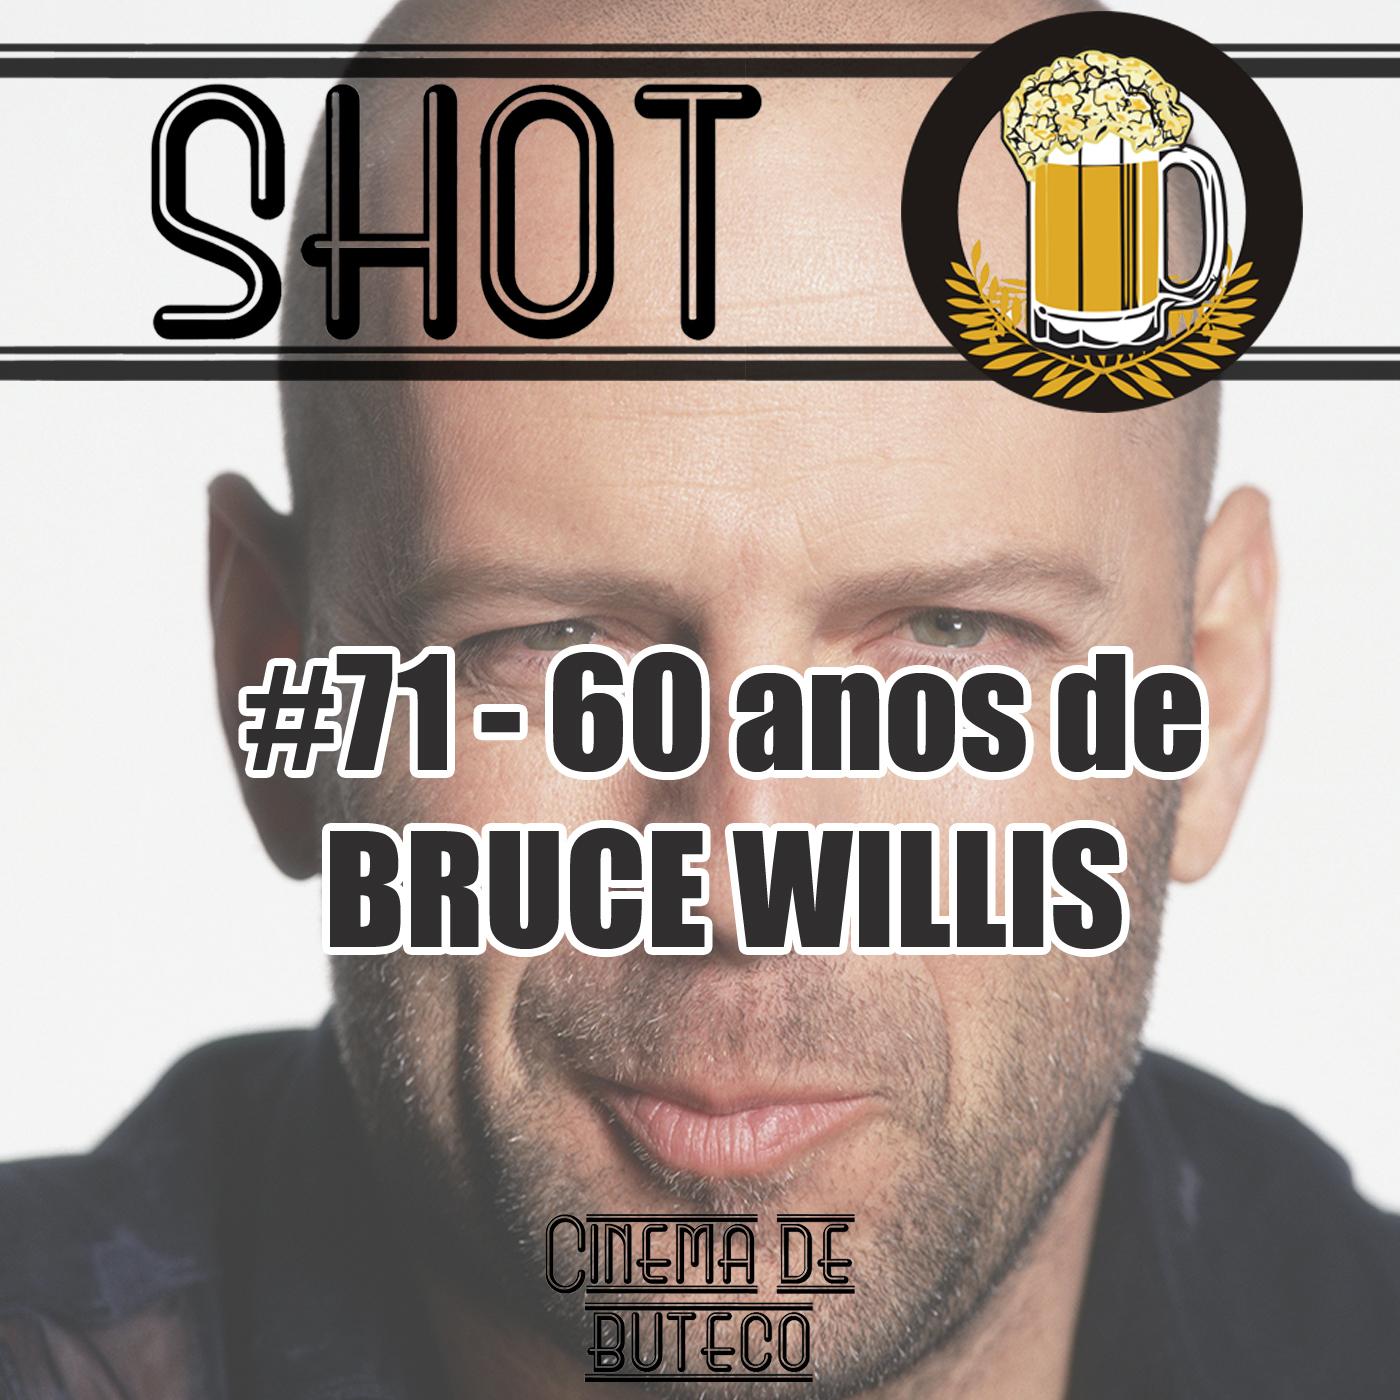 Shot71-BruceWillis